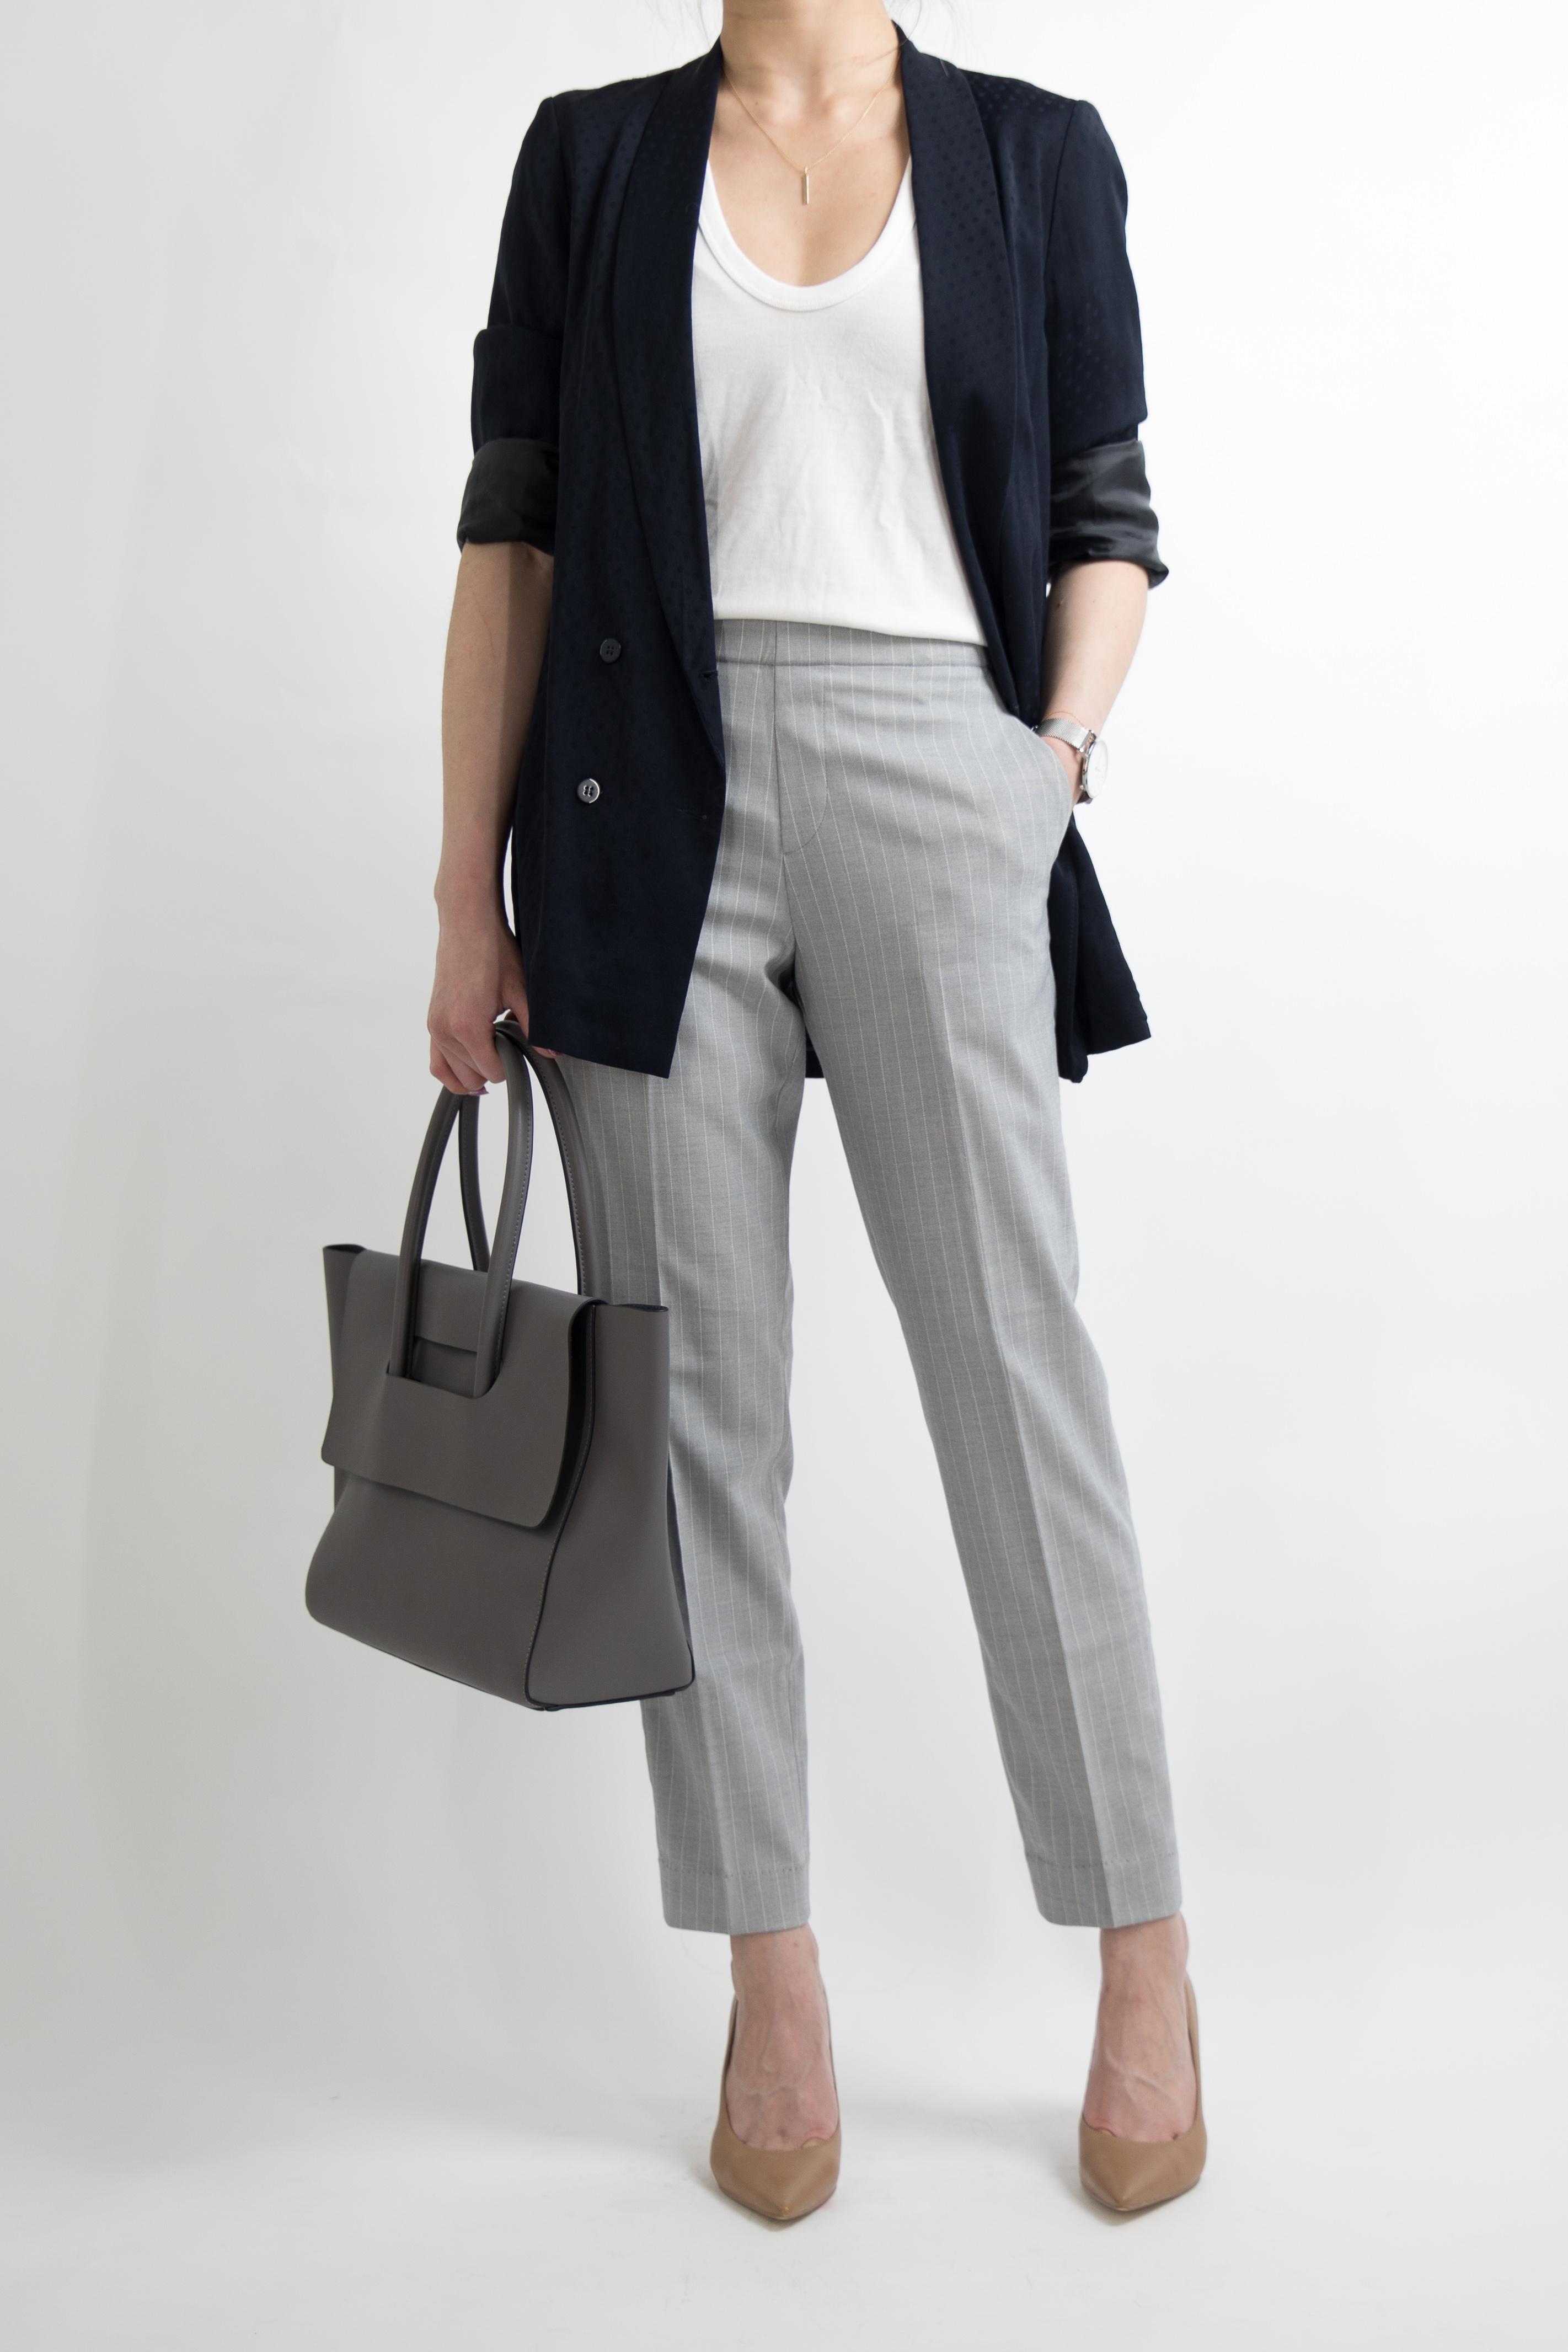 professional business casual attire photo - 1